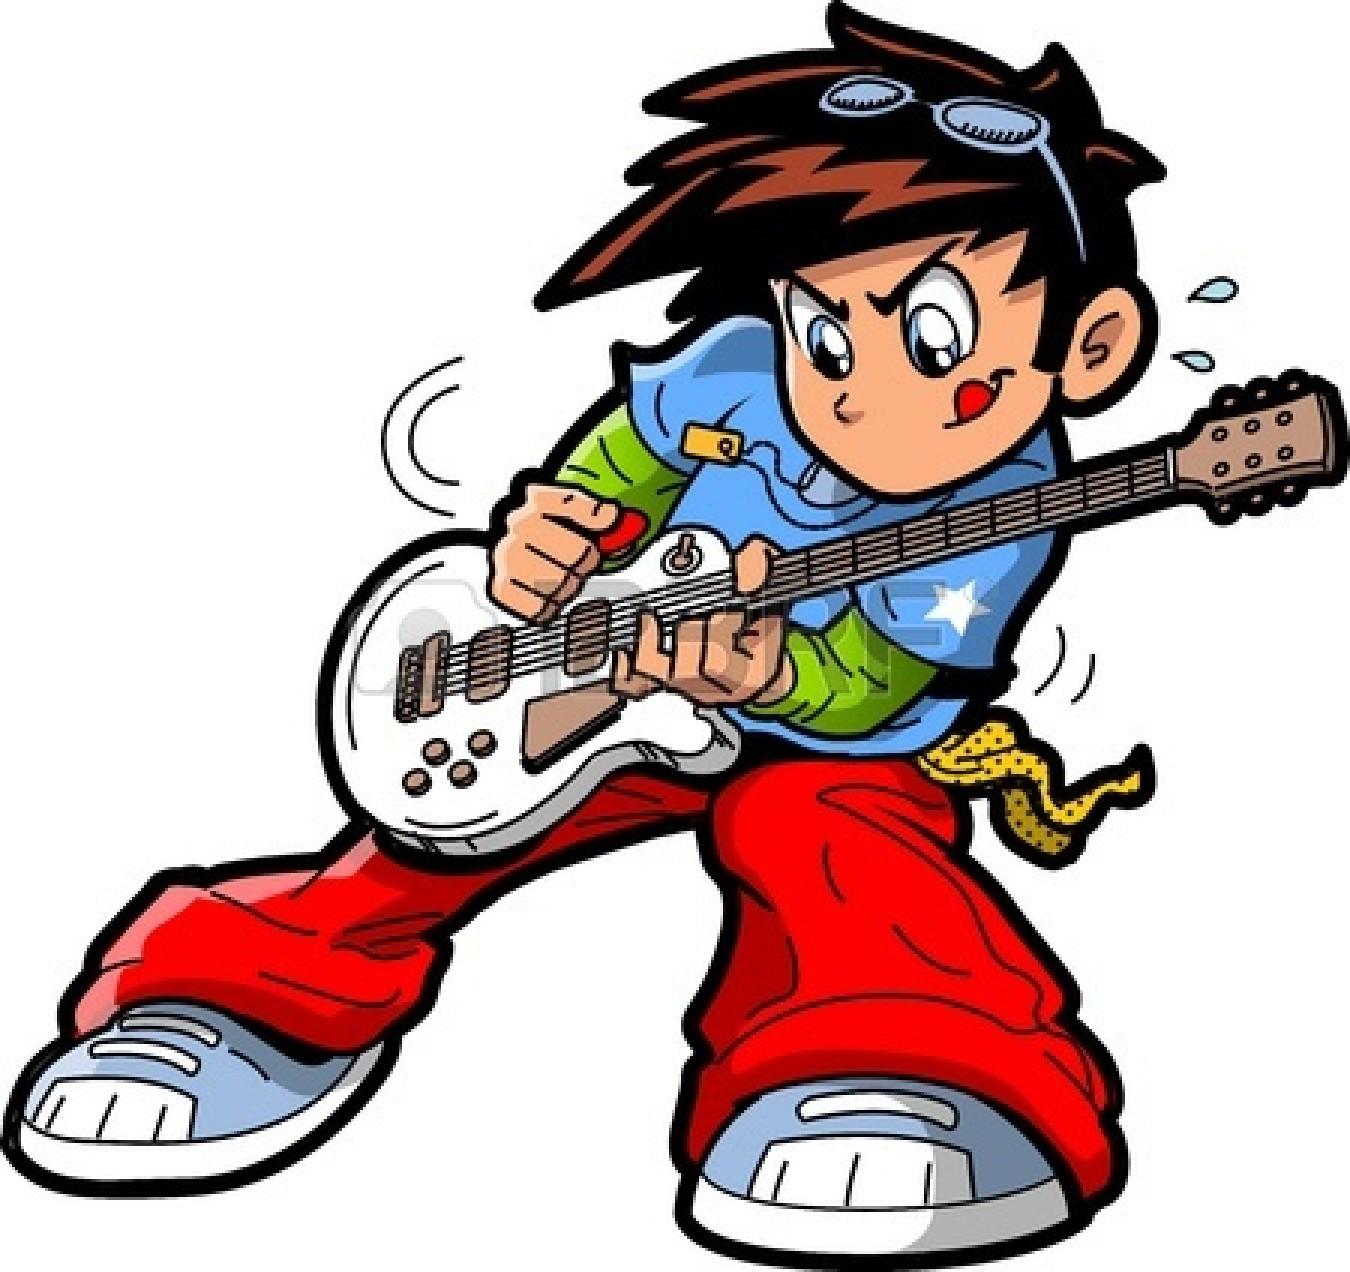 Free rockstar cliparts download. Clipart rock boy